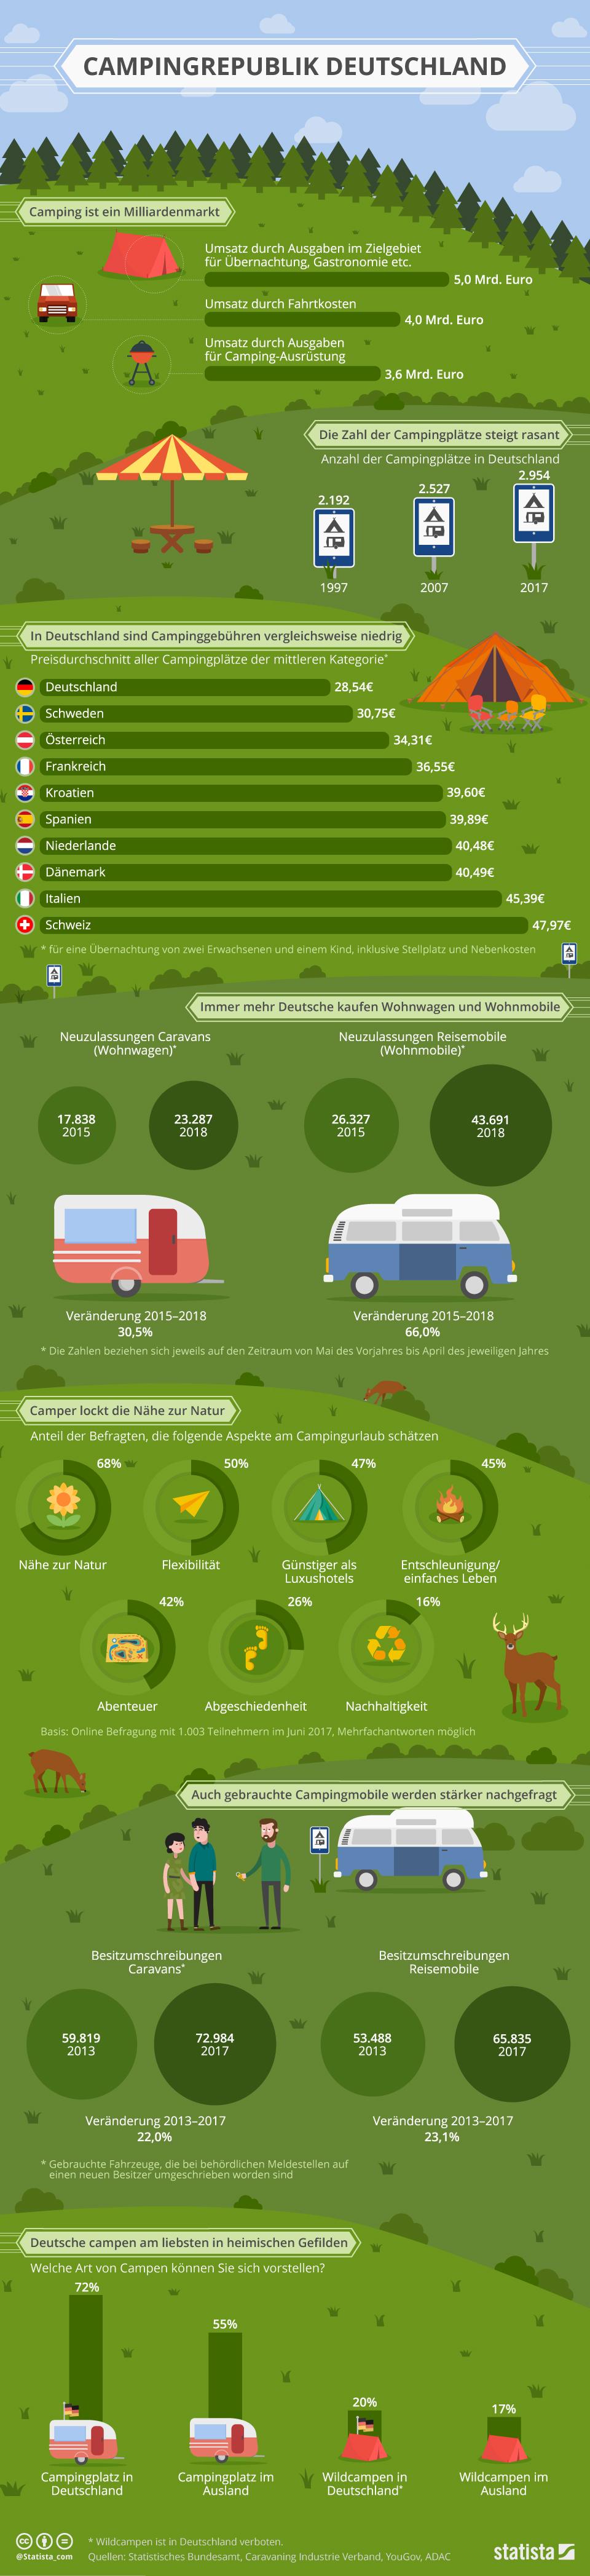 Infografik: Campingrepublik Deutschland | Statista